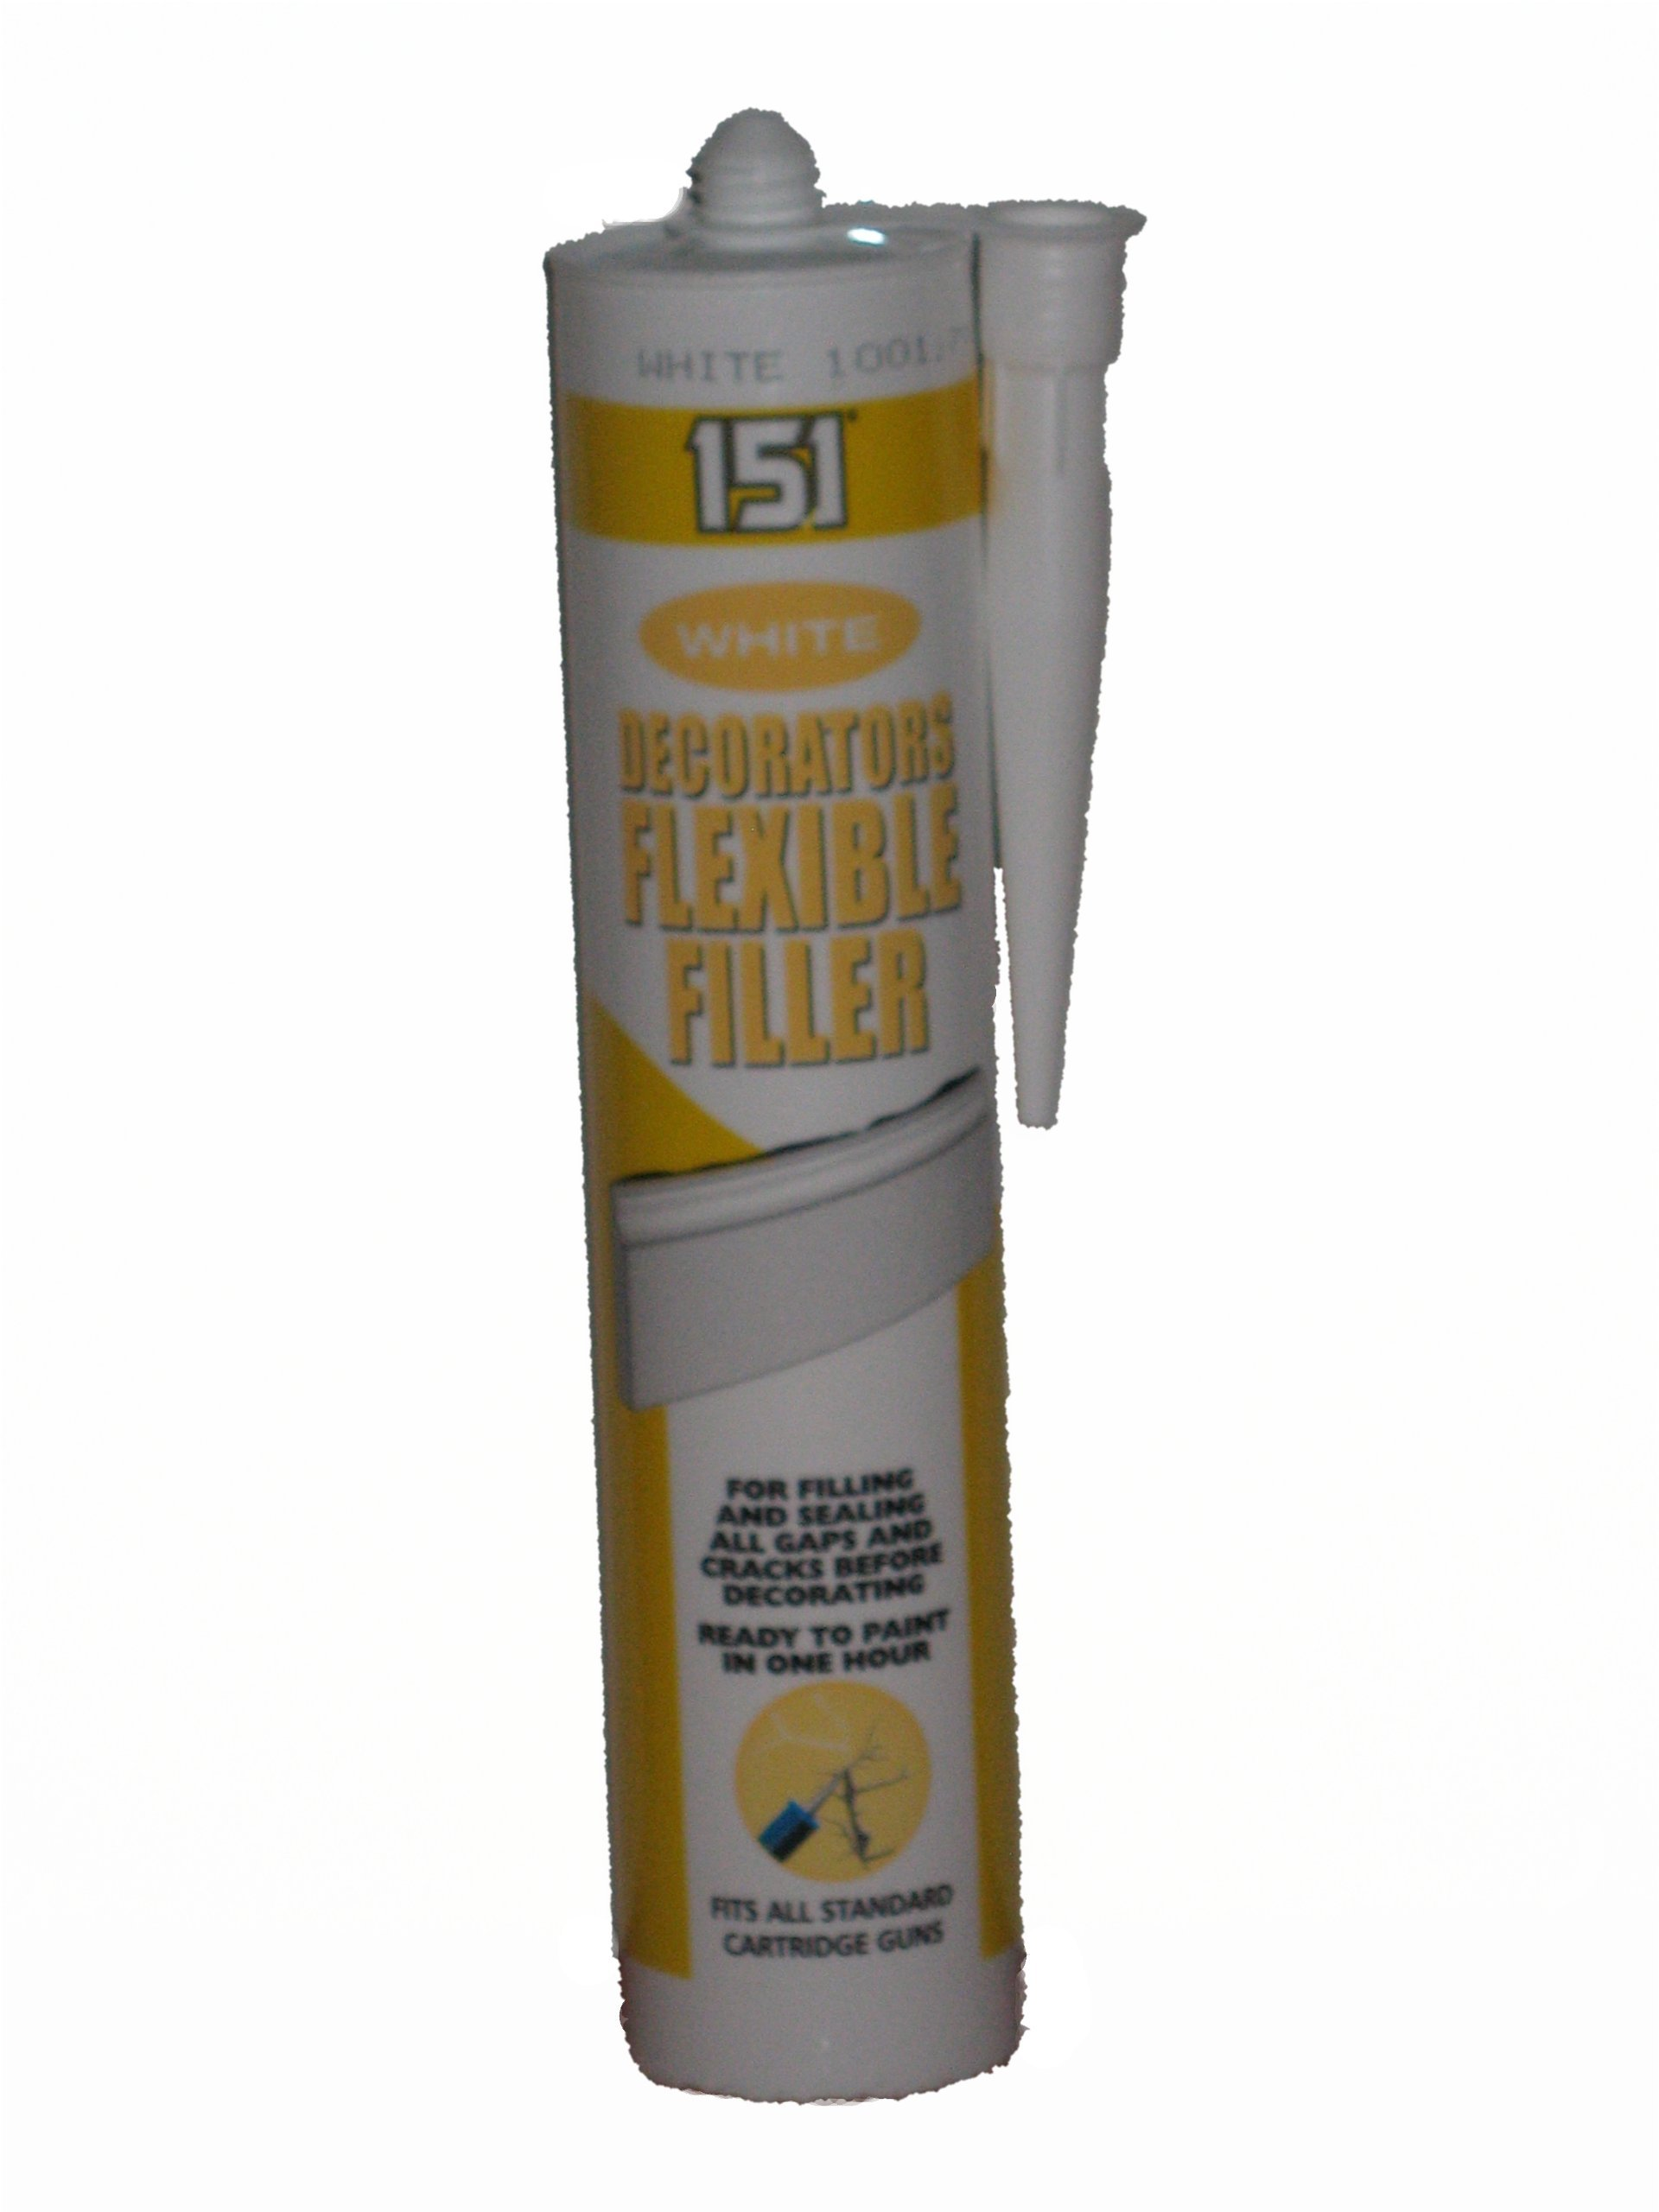 151 Decorative Flexible Filler 310Ml Cartridge